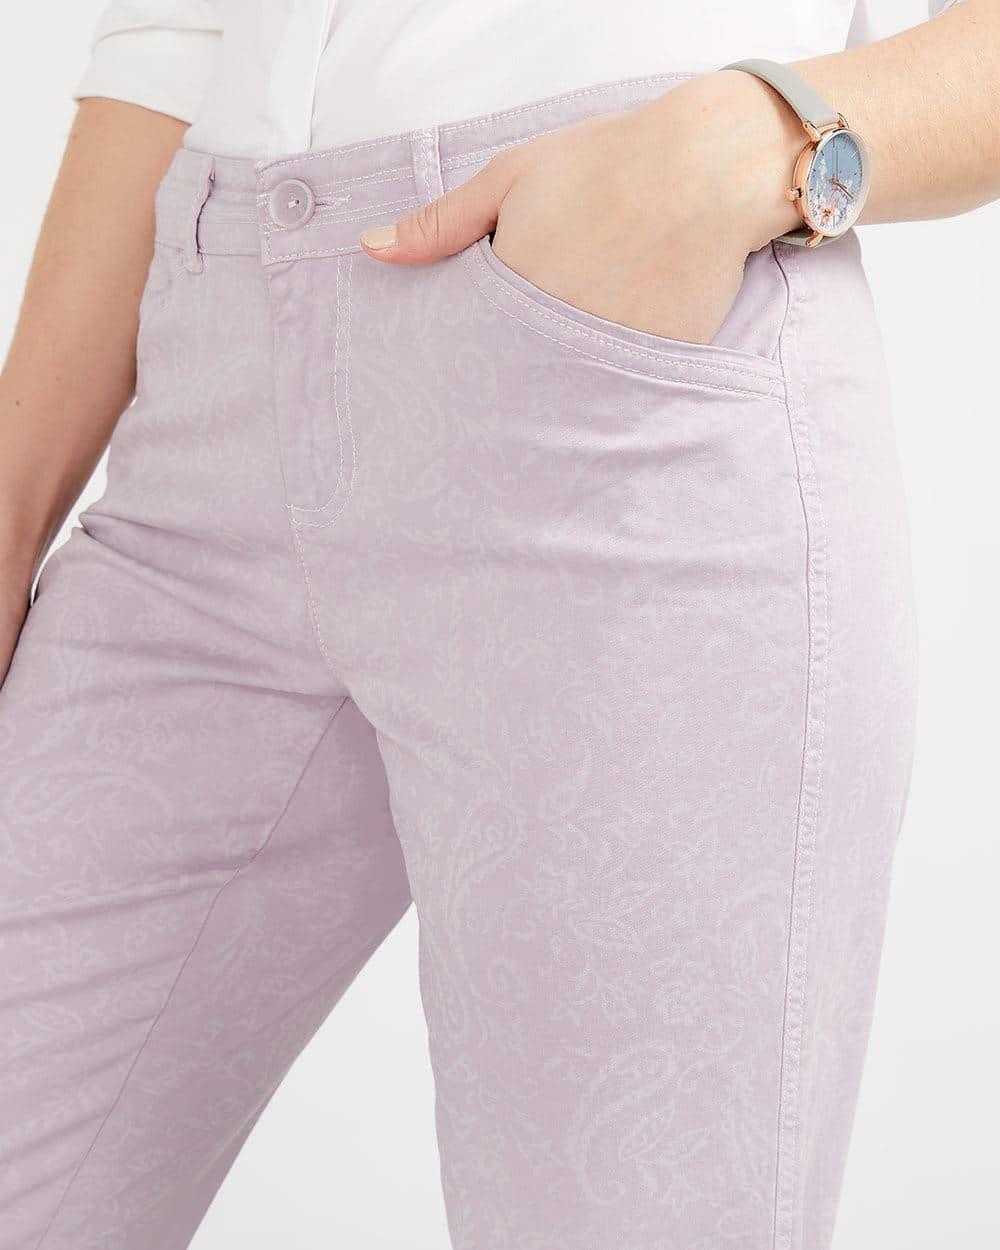 Laser Print Chino Pants